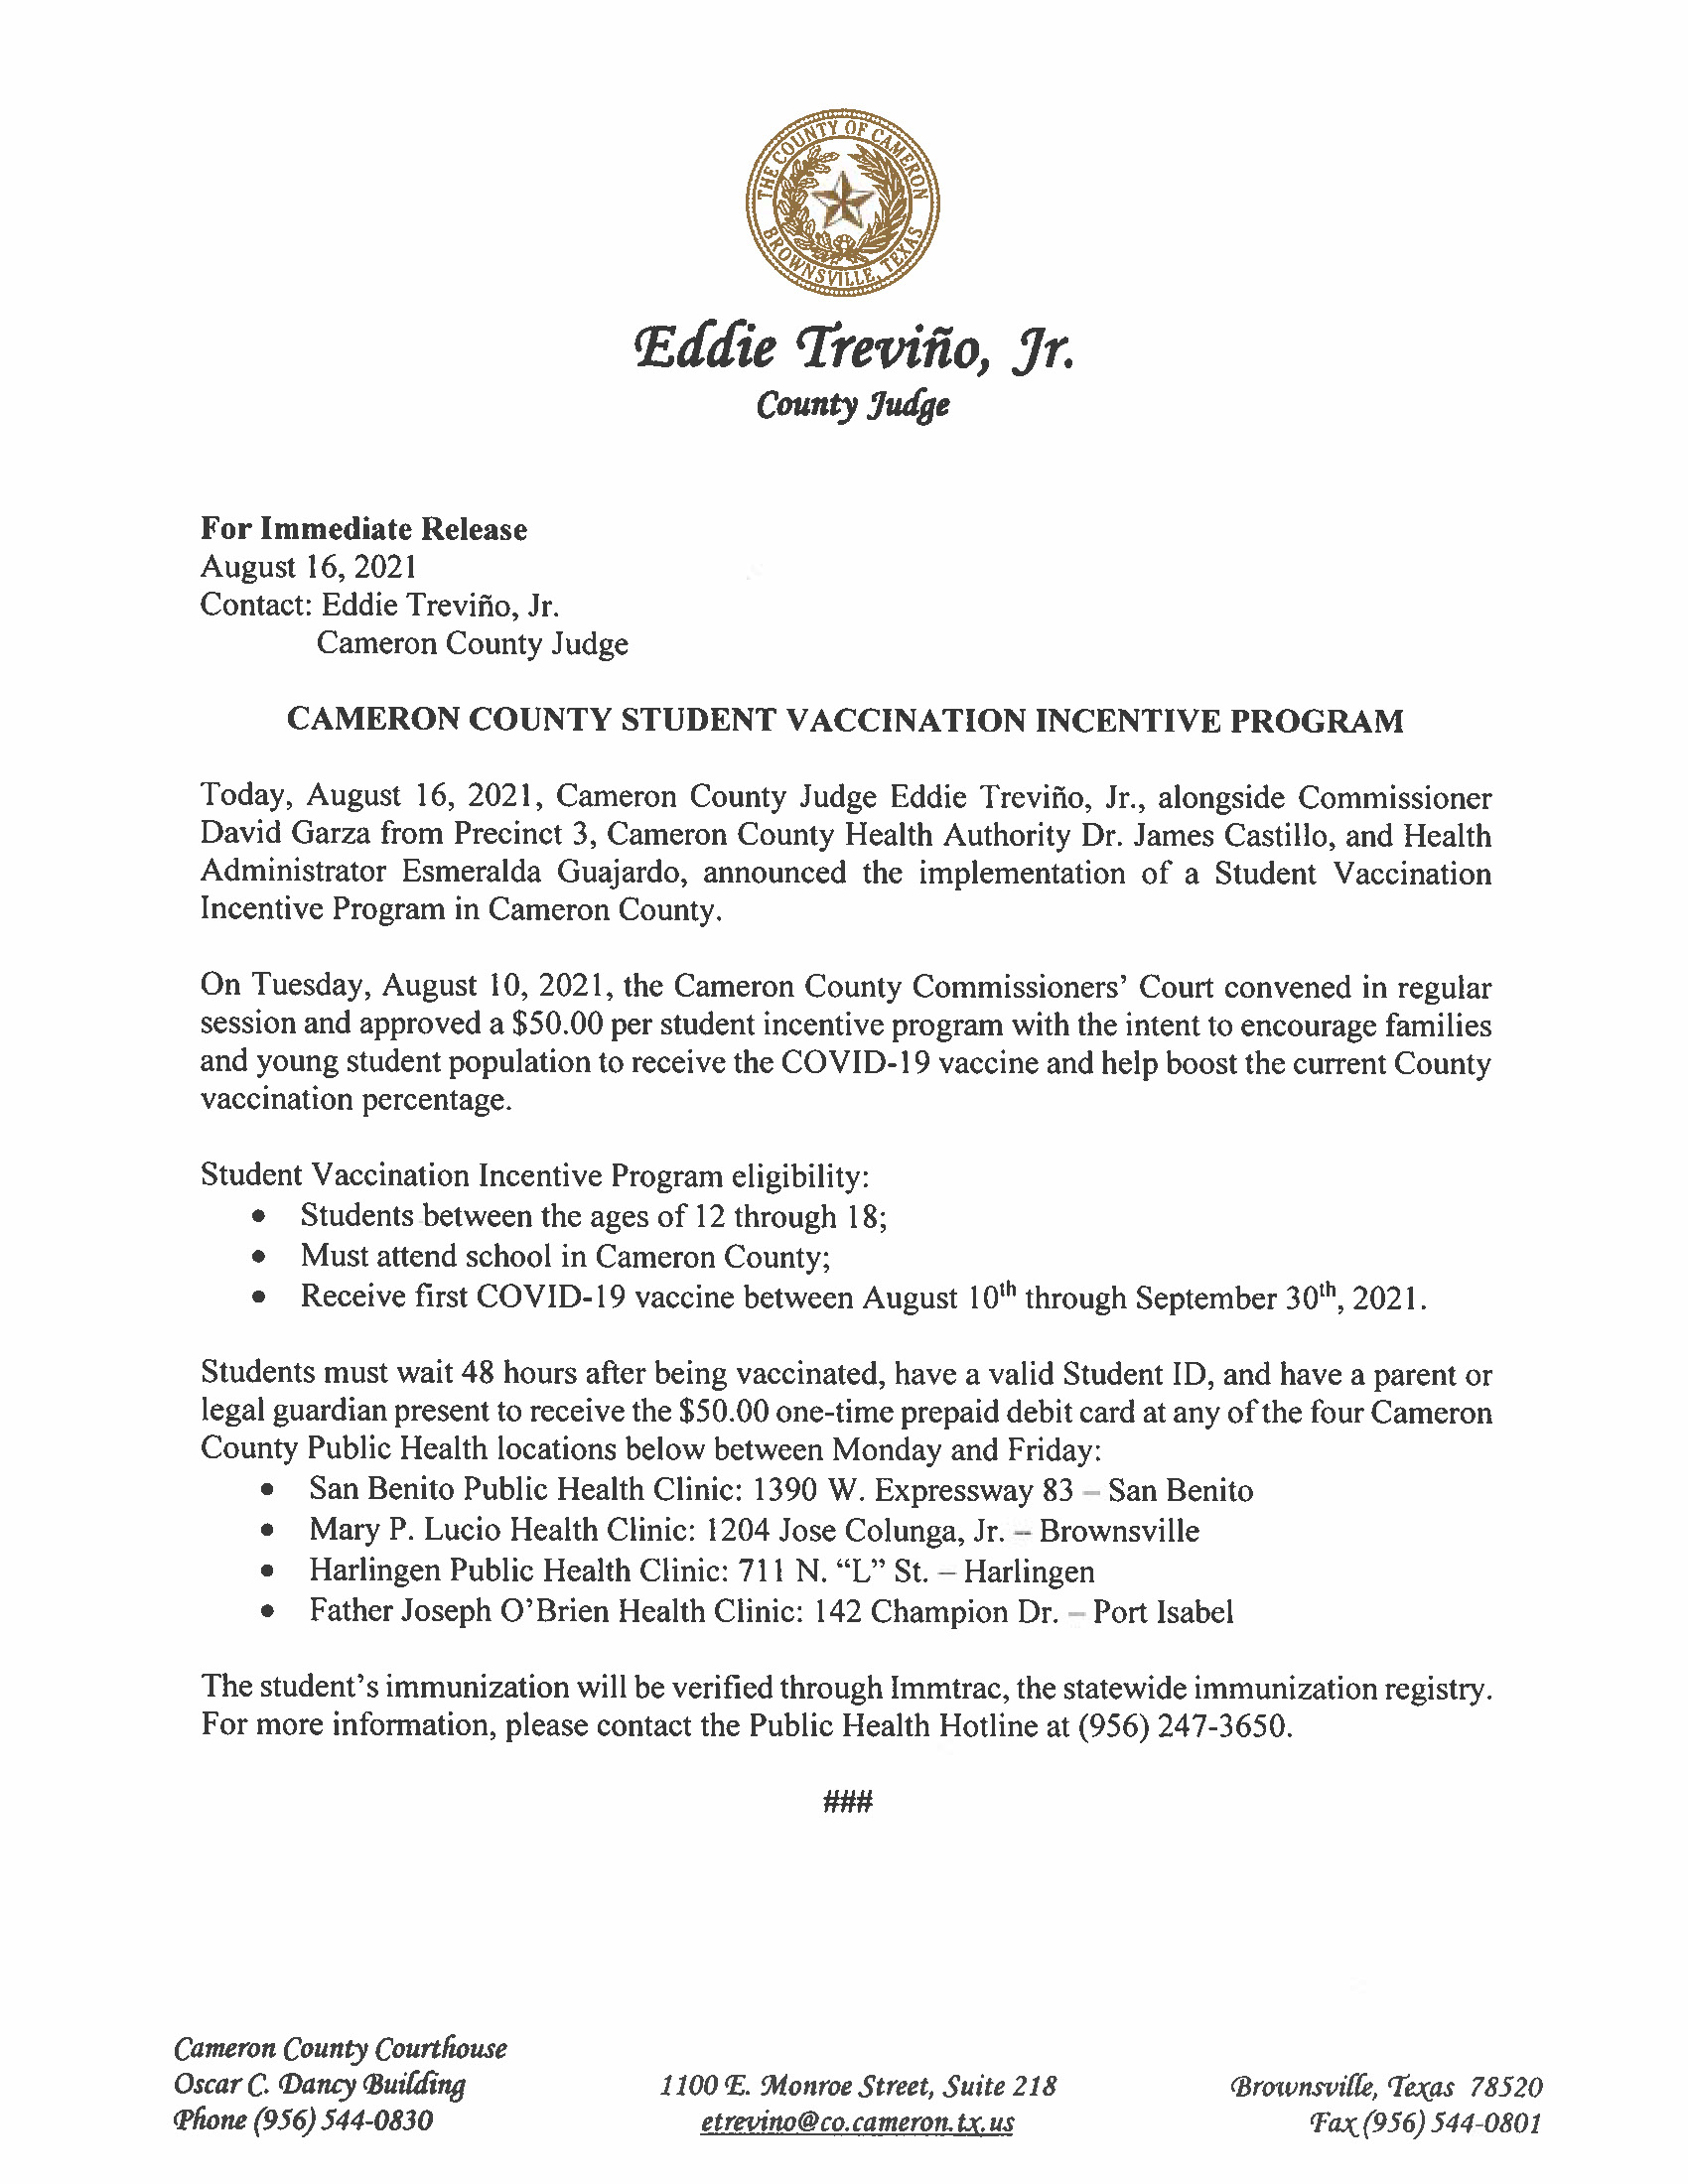 8.16.21 Cameron County Student Vaccination Incentive Program